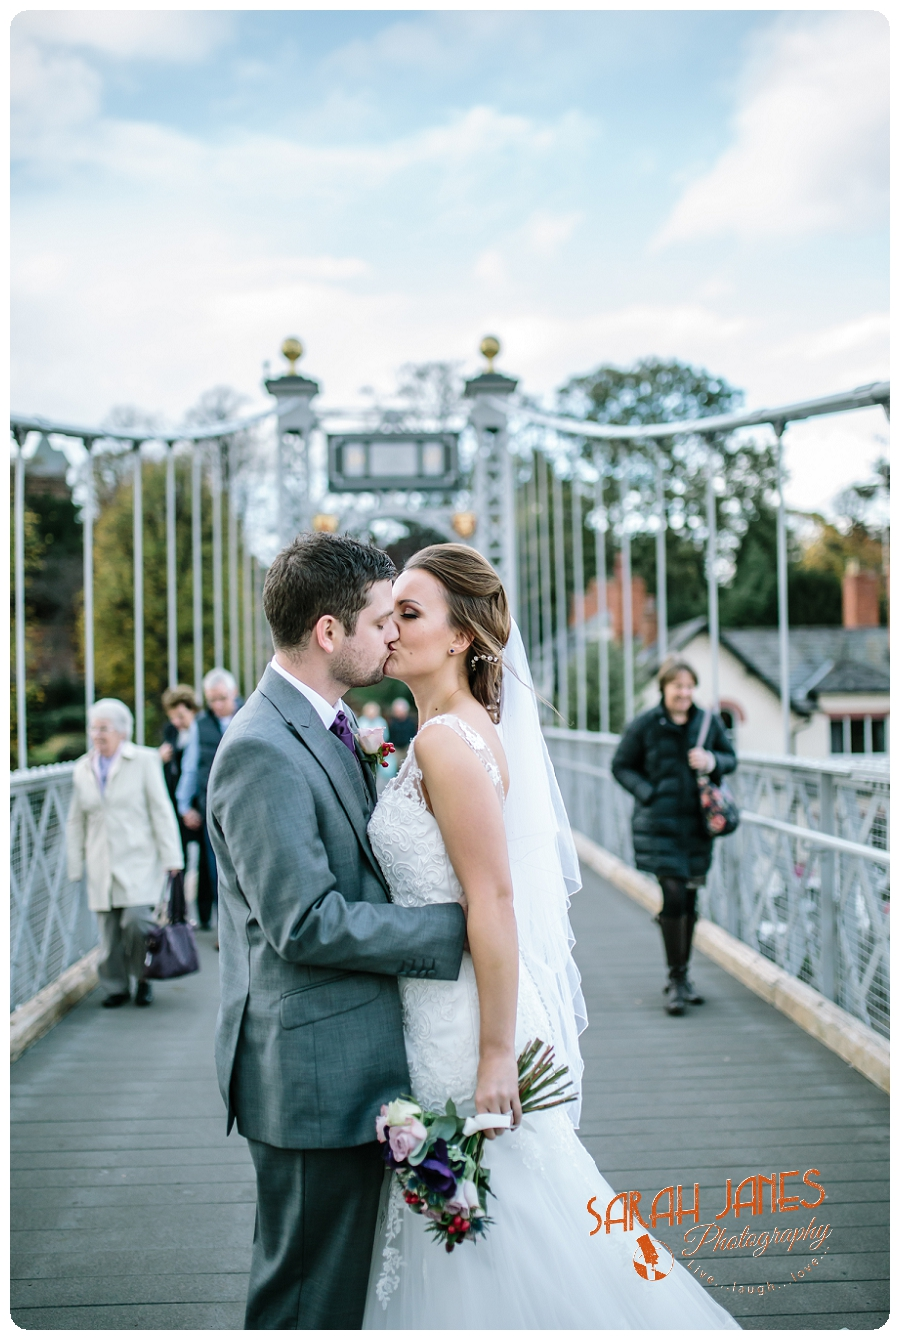 Wedding photography Chester, Weddings Rowton Hall, Wedding photography at Rowton Hall, Sarah Janes Photograpphy_0035.jpg